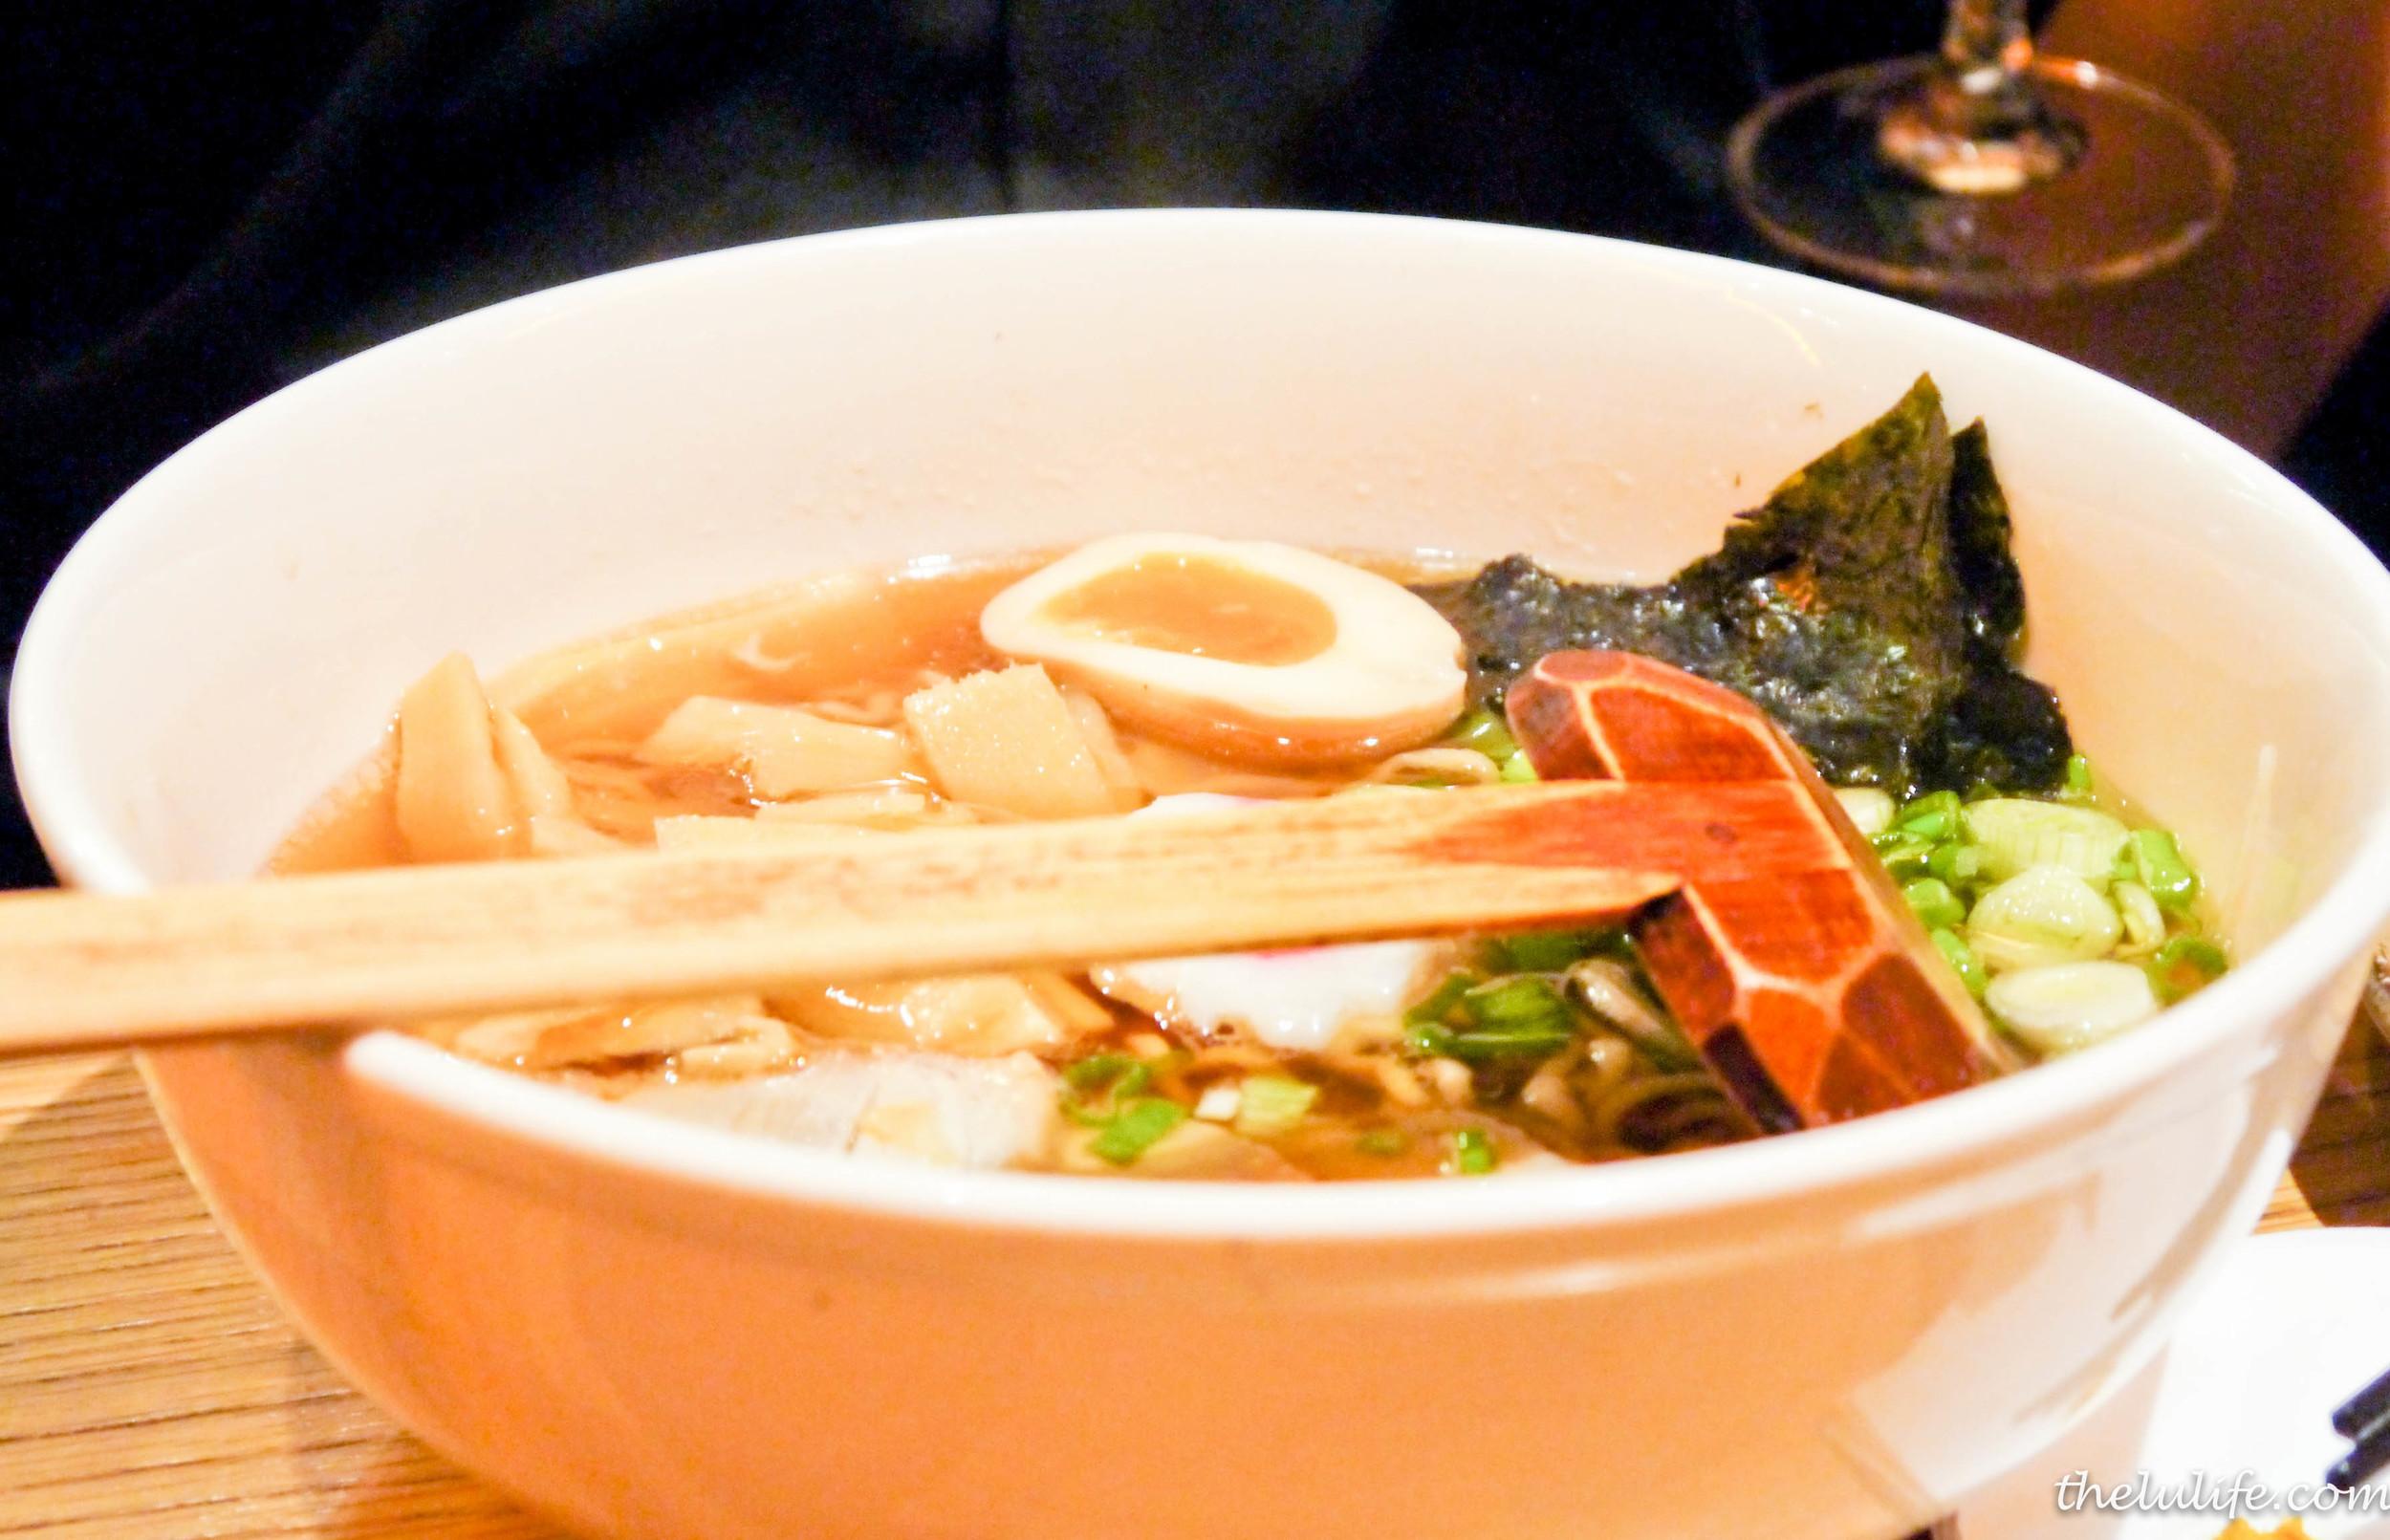 Tokyo Shoyu: thin hosomen noodles in a soy pork broth, BBQ pork, nitamago nori, pickled bamboo, naruto fish cake, spring onion and bonito flakes